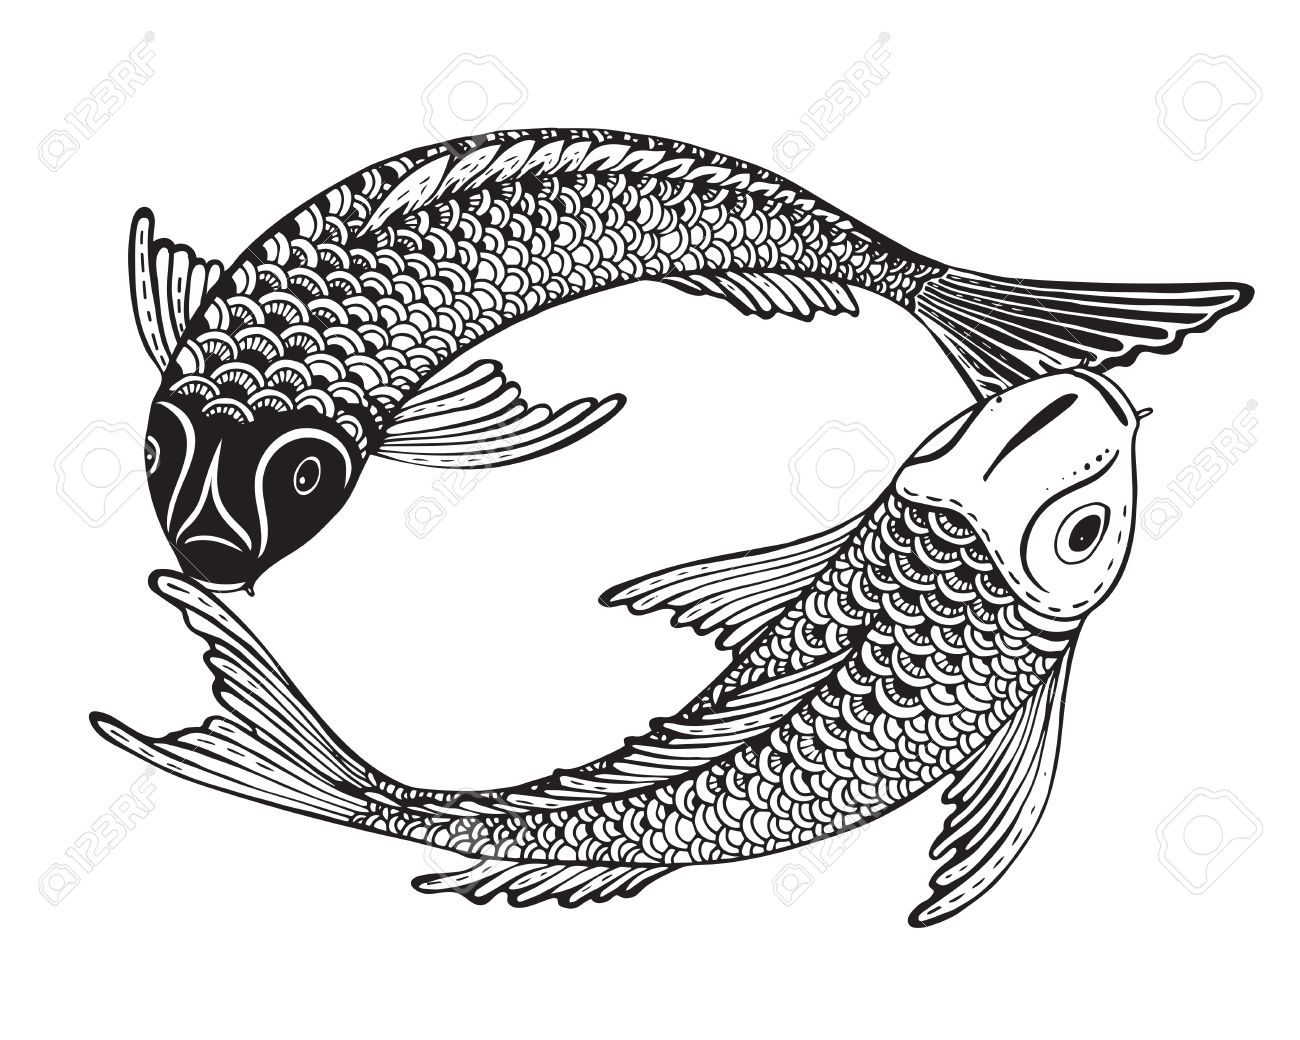 Dibujado A Mano Ilustración Vectorial De Dos Peces Koi (carpa ...